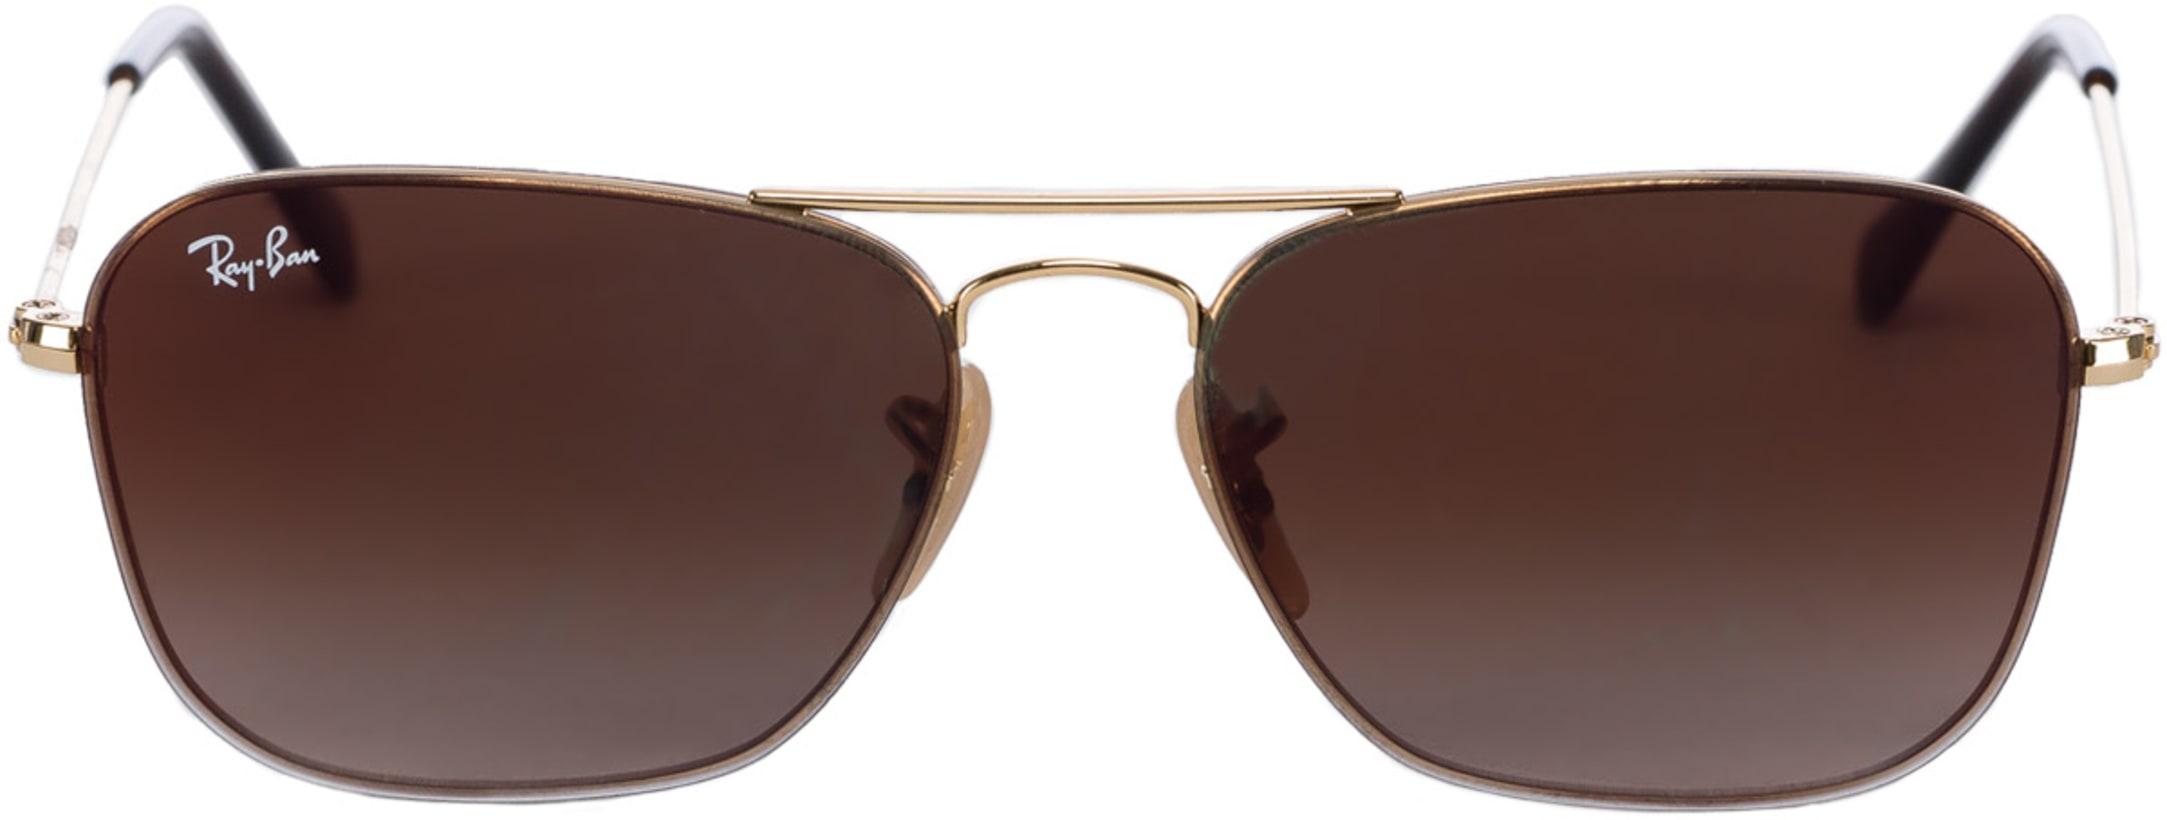 99d9e994d Ray-Ban. Square Gradient Mirror Sunglasses - Gold/Brown Gradient Mirror